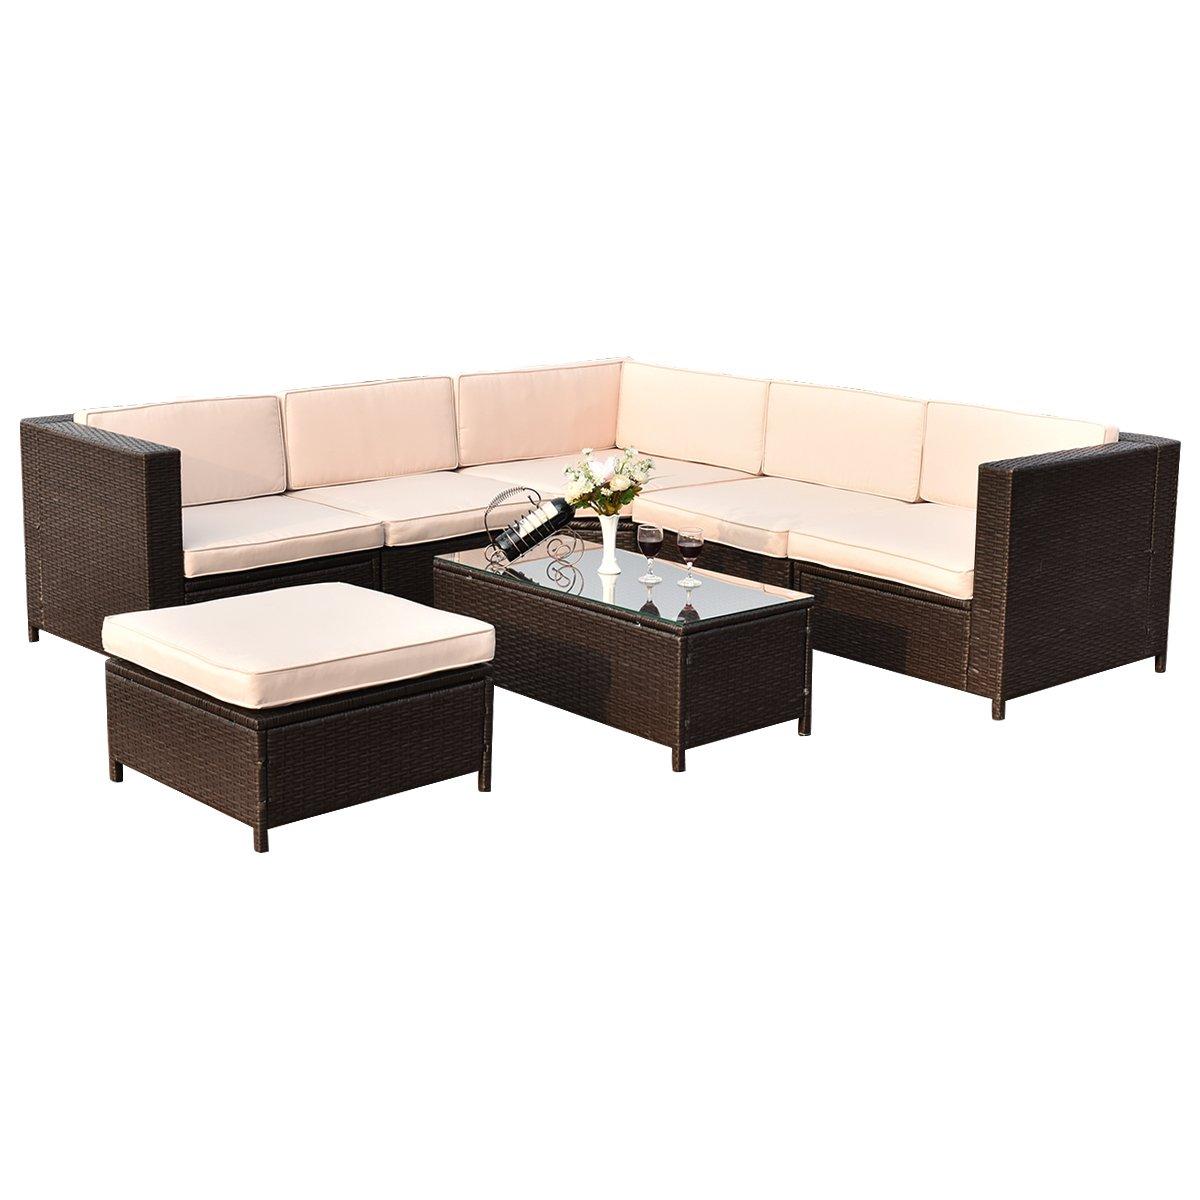 Amazon.com: Tangkula - Set de 7 unidades de muebles de ...